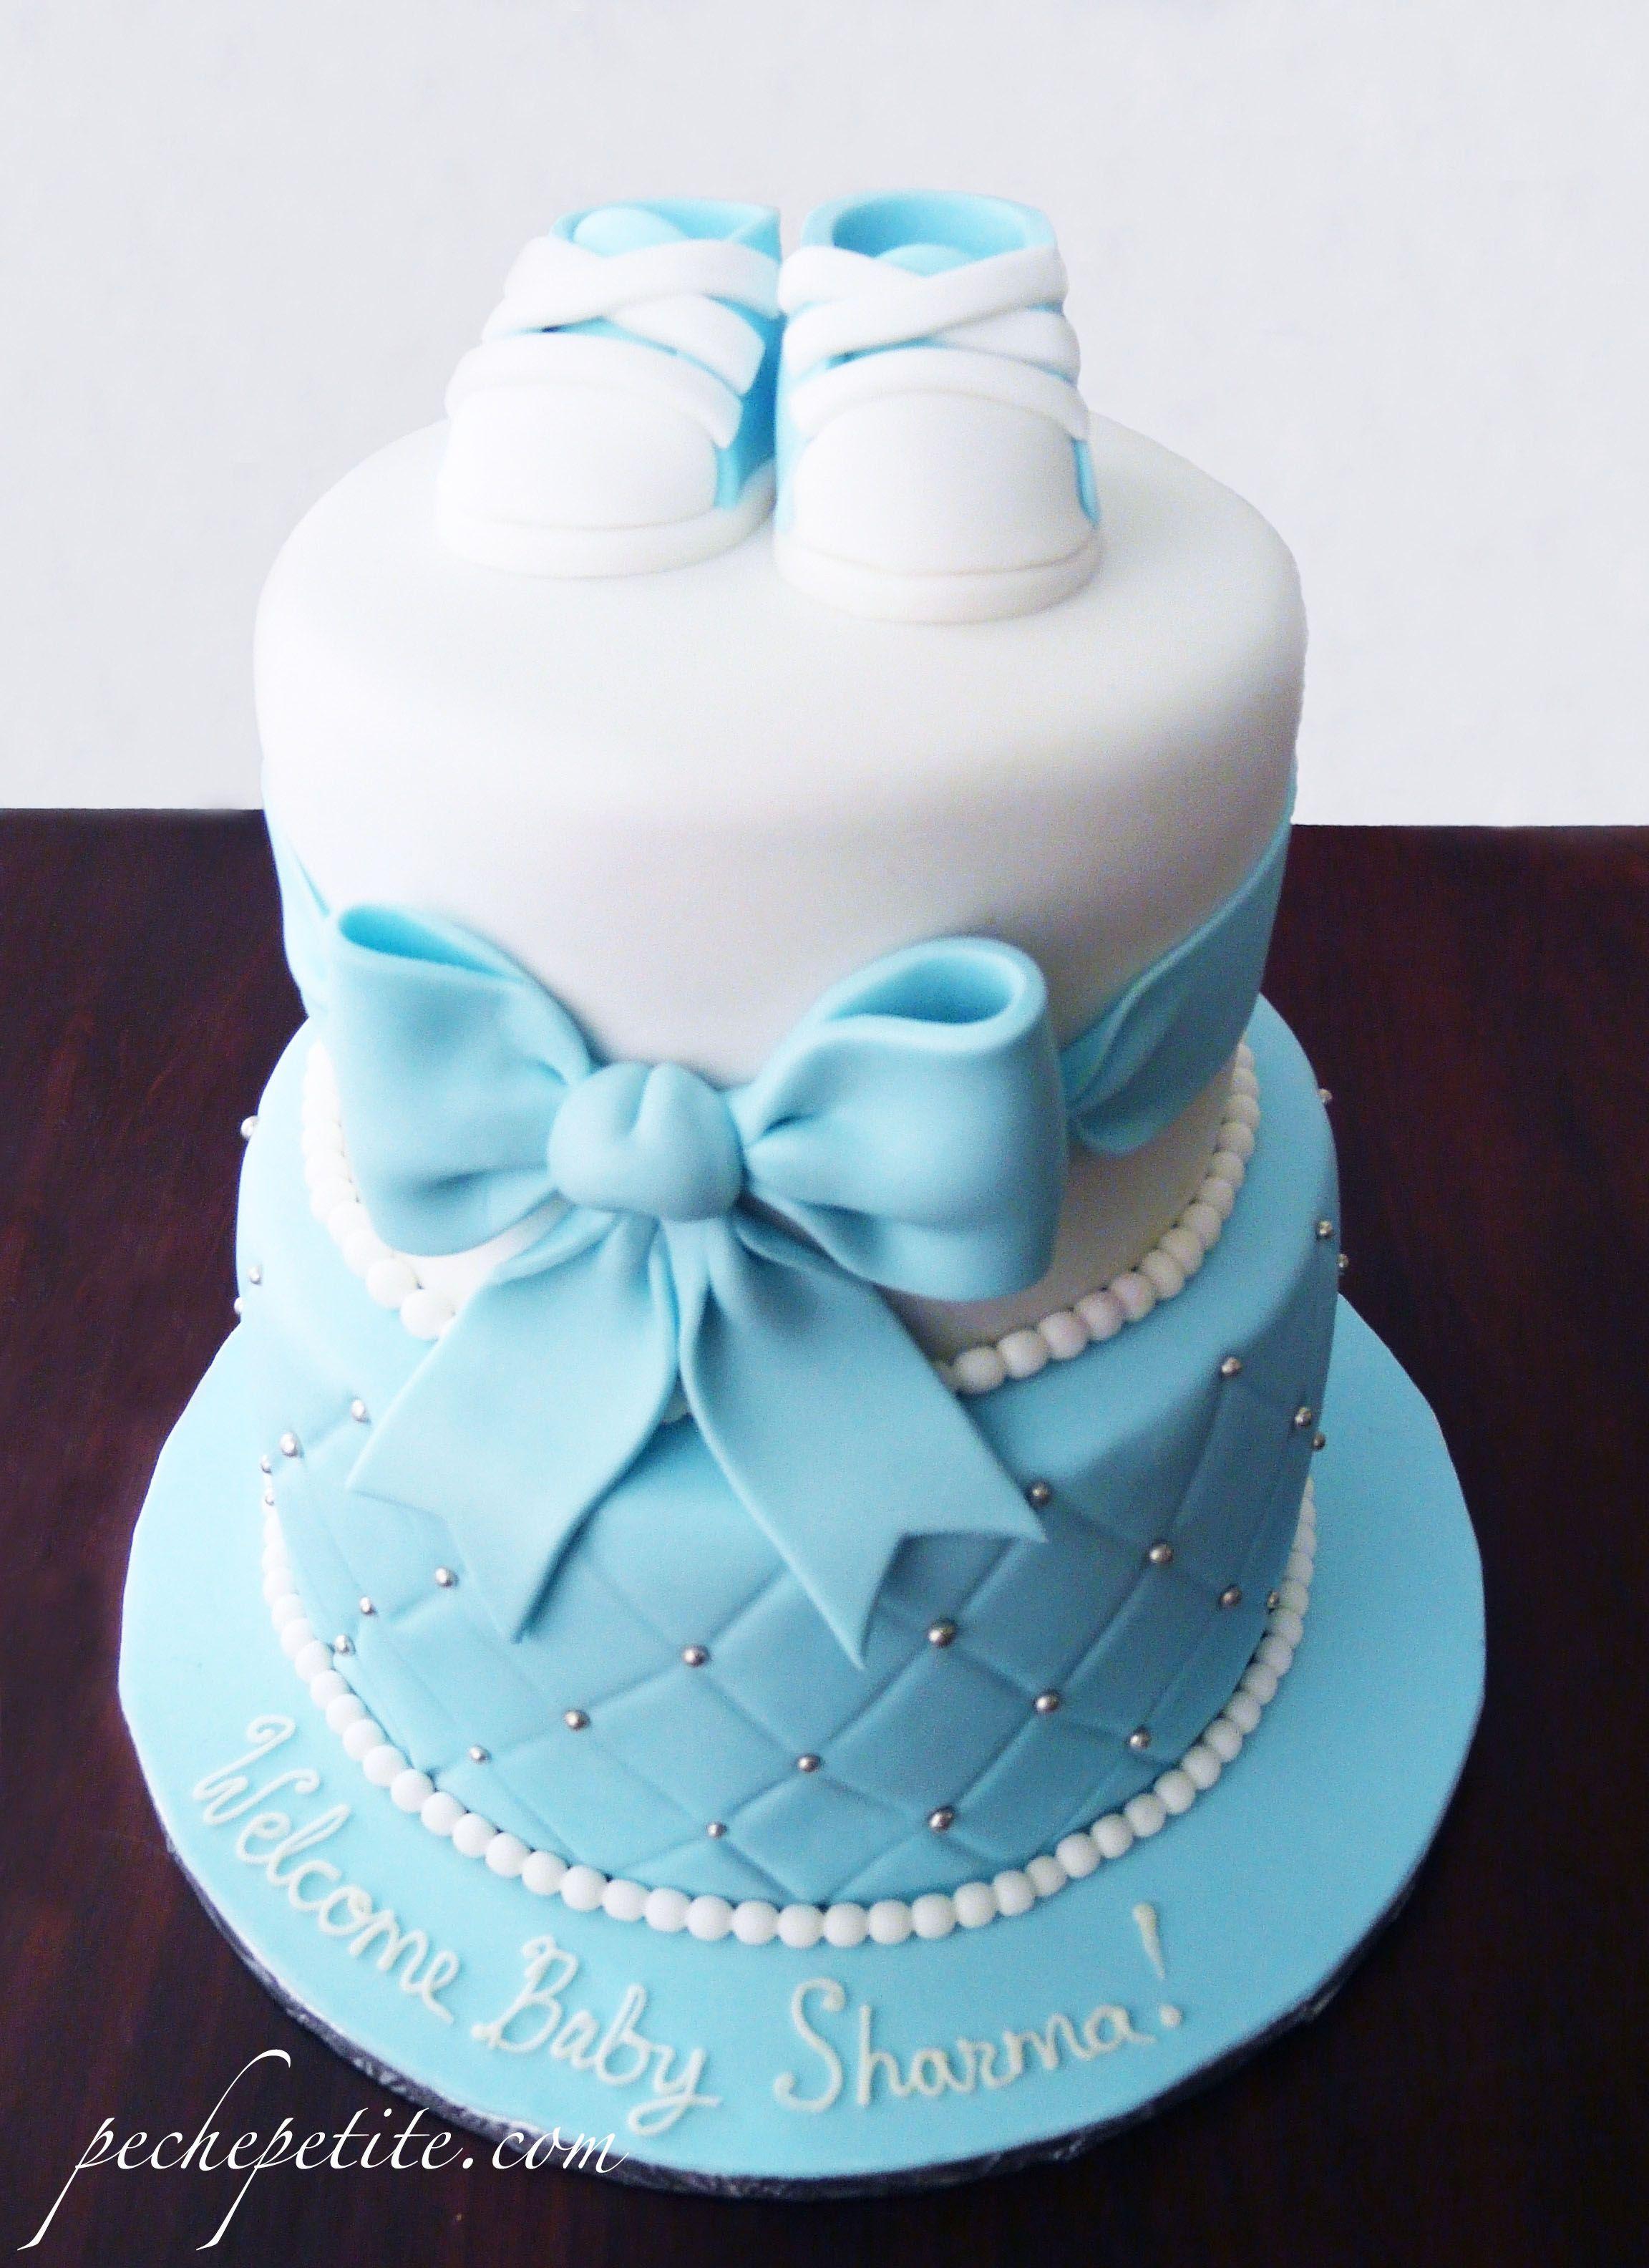 Classic Elegant Baby Boy Shower Cake Pche Petite Baby Shower